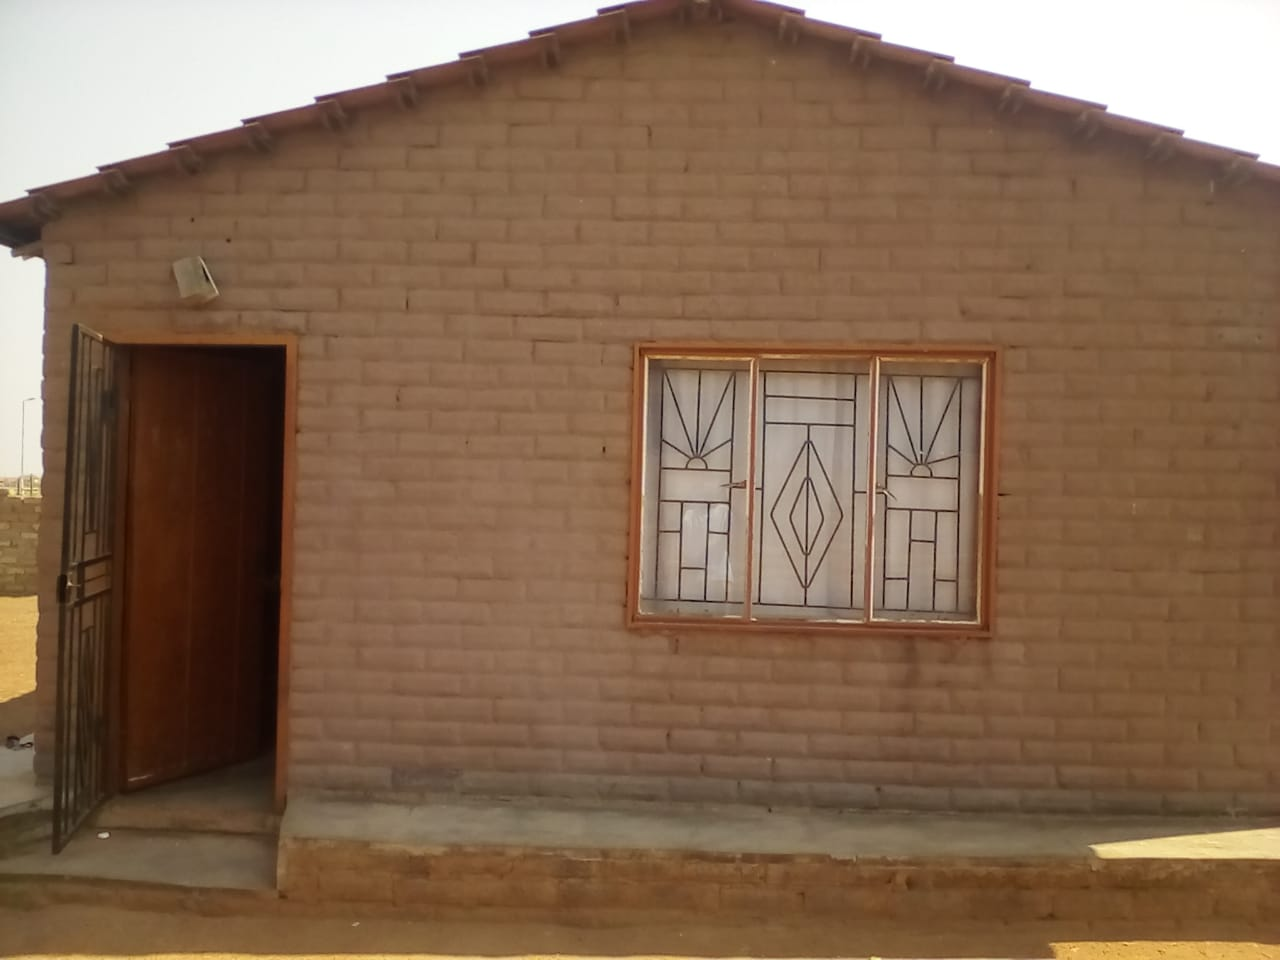 2BEDROOMS AT WINTERVELDT, MABOPANE FOR SALE